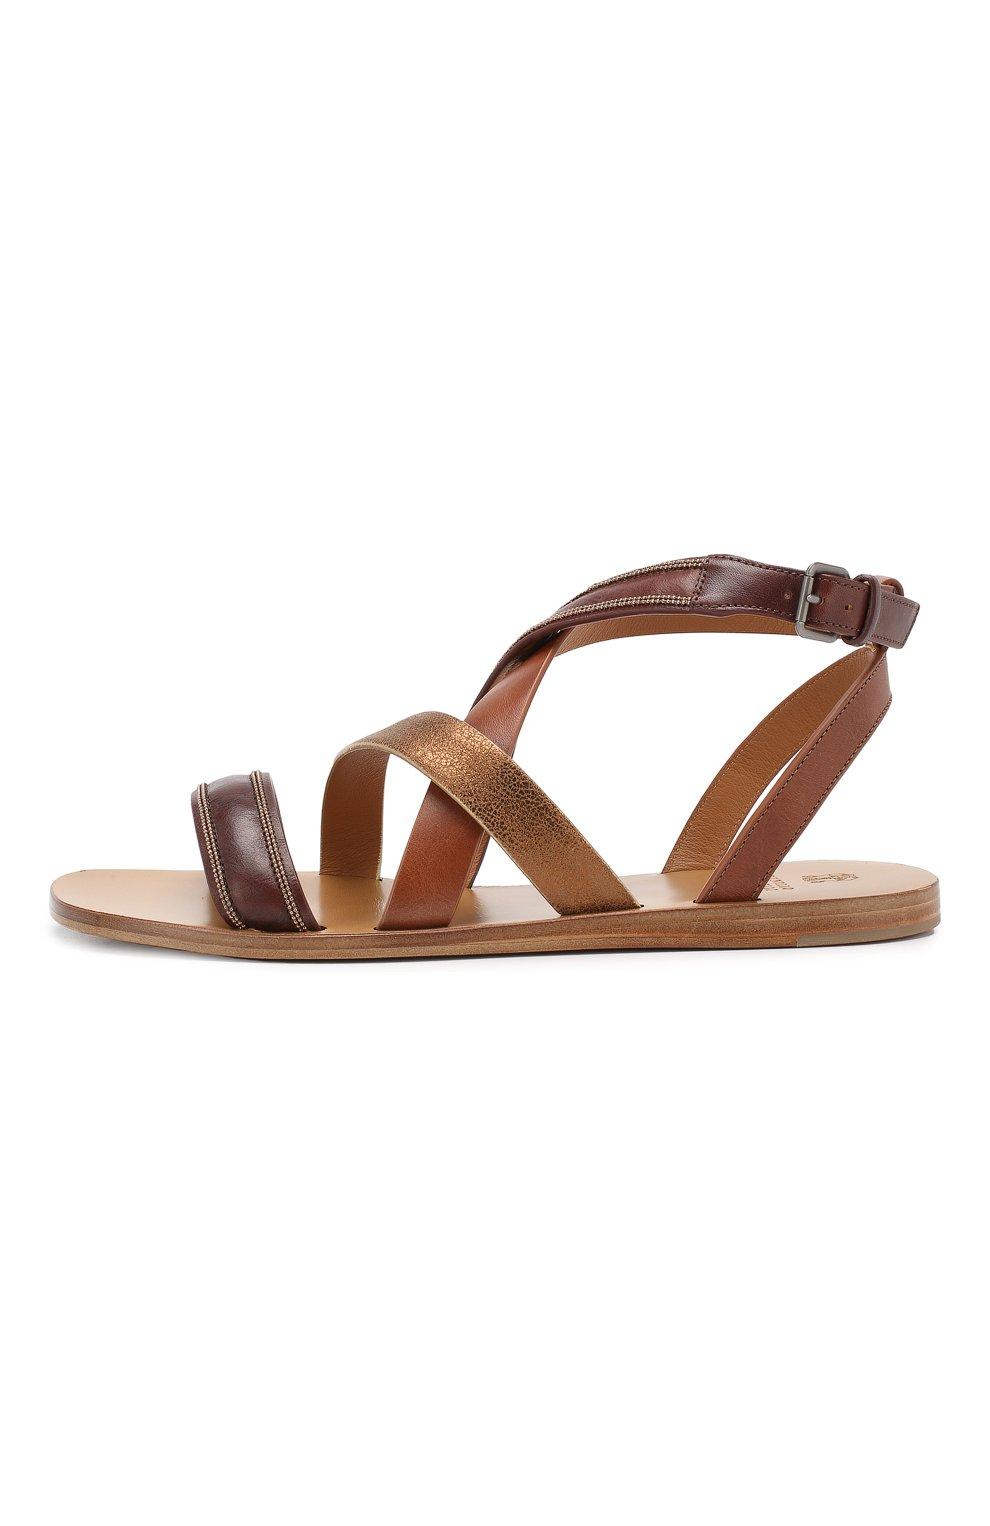 Кожаные сандалии Brunello Cucinelli коричневые | Фото №3